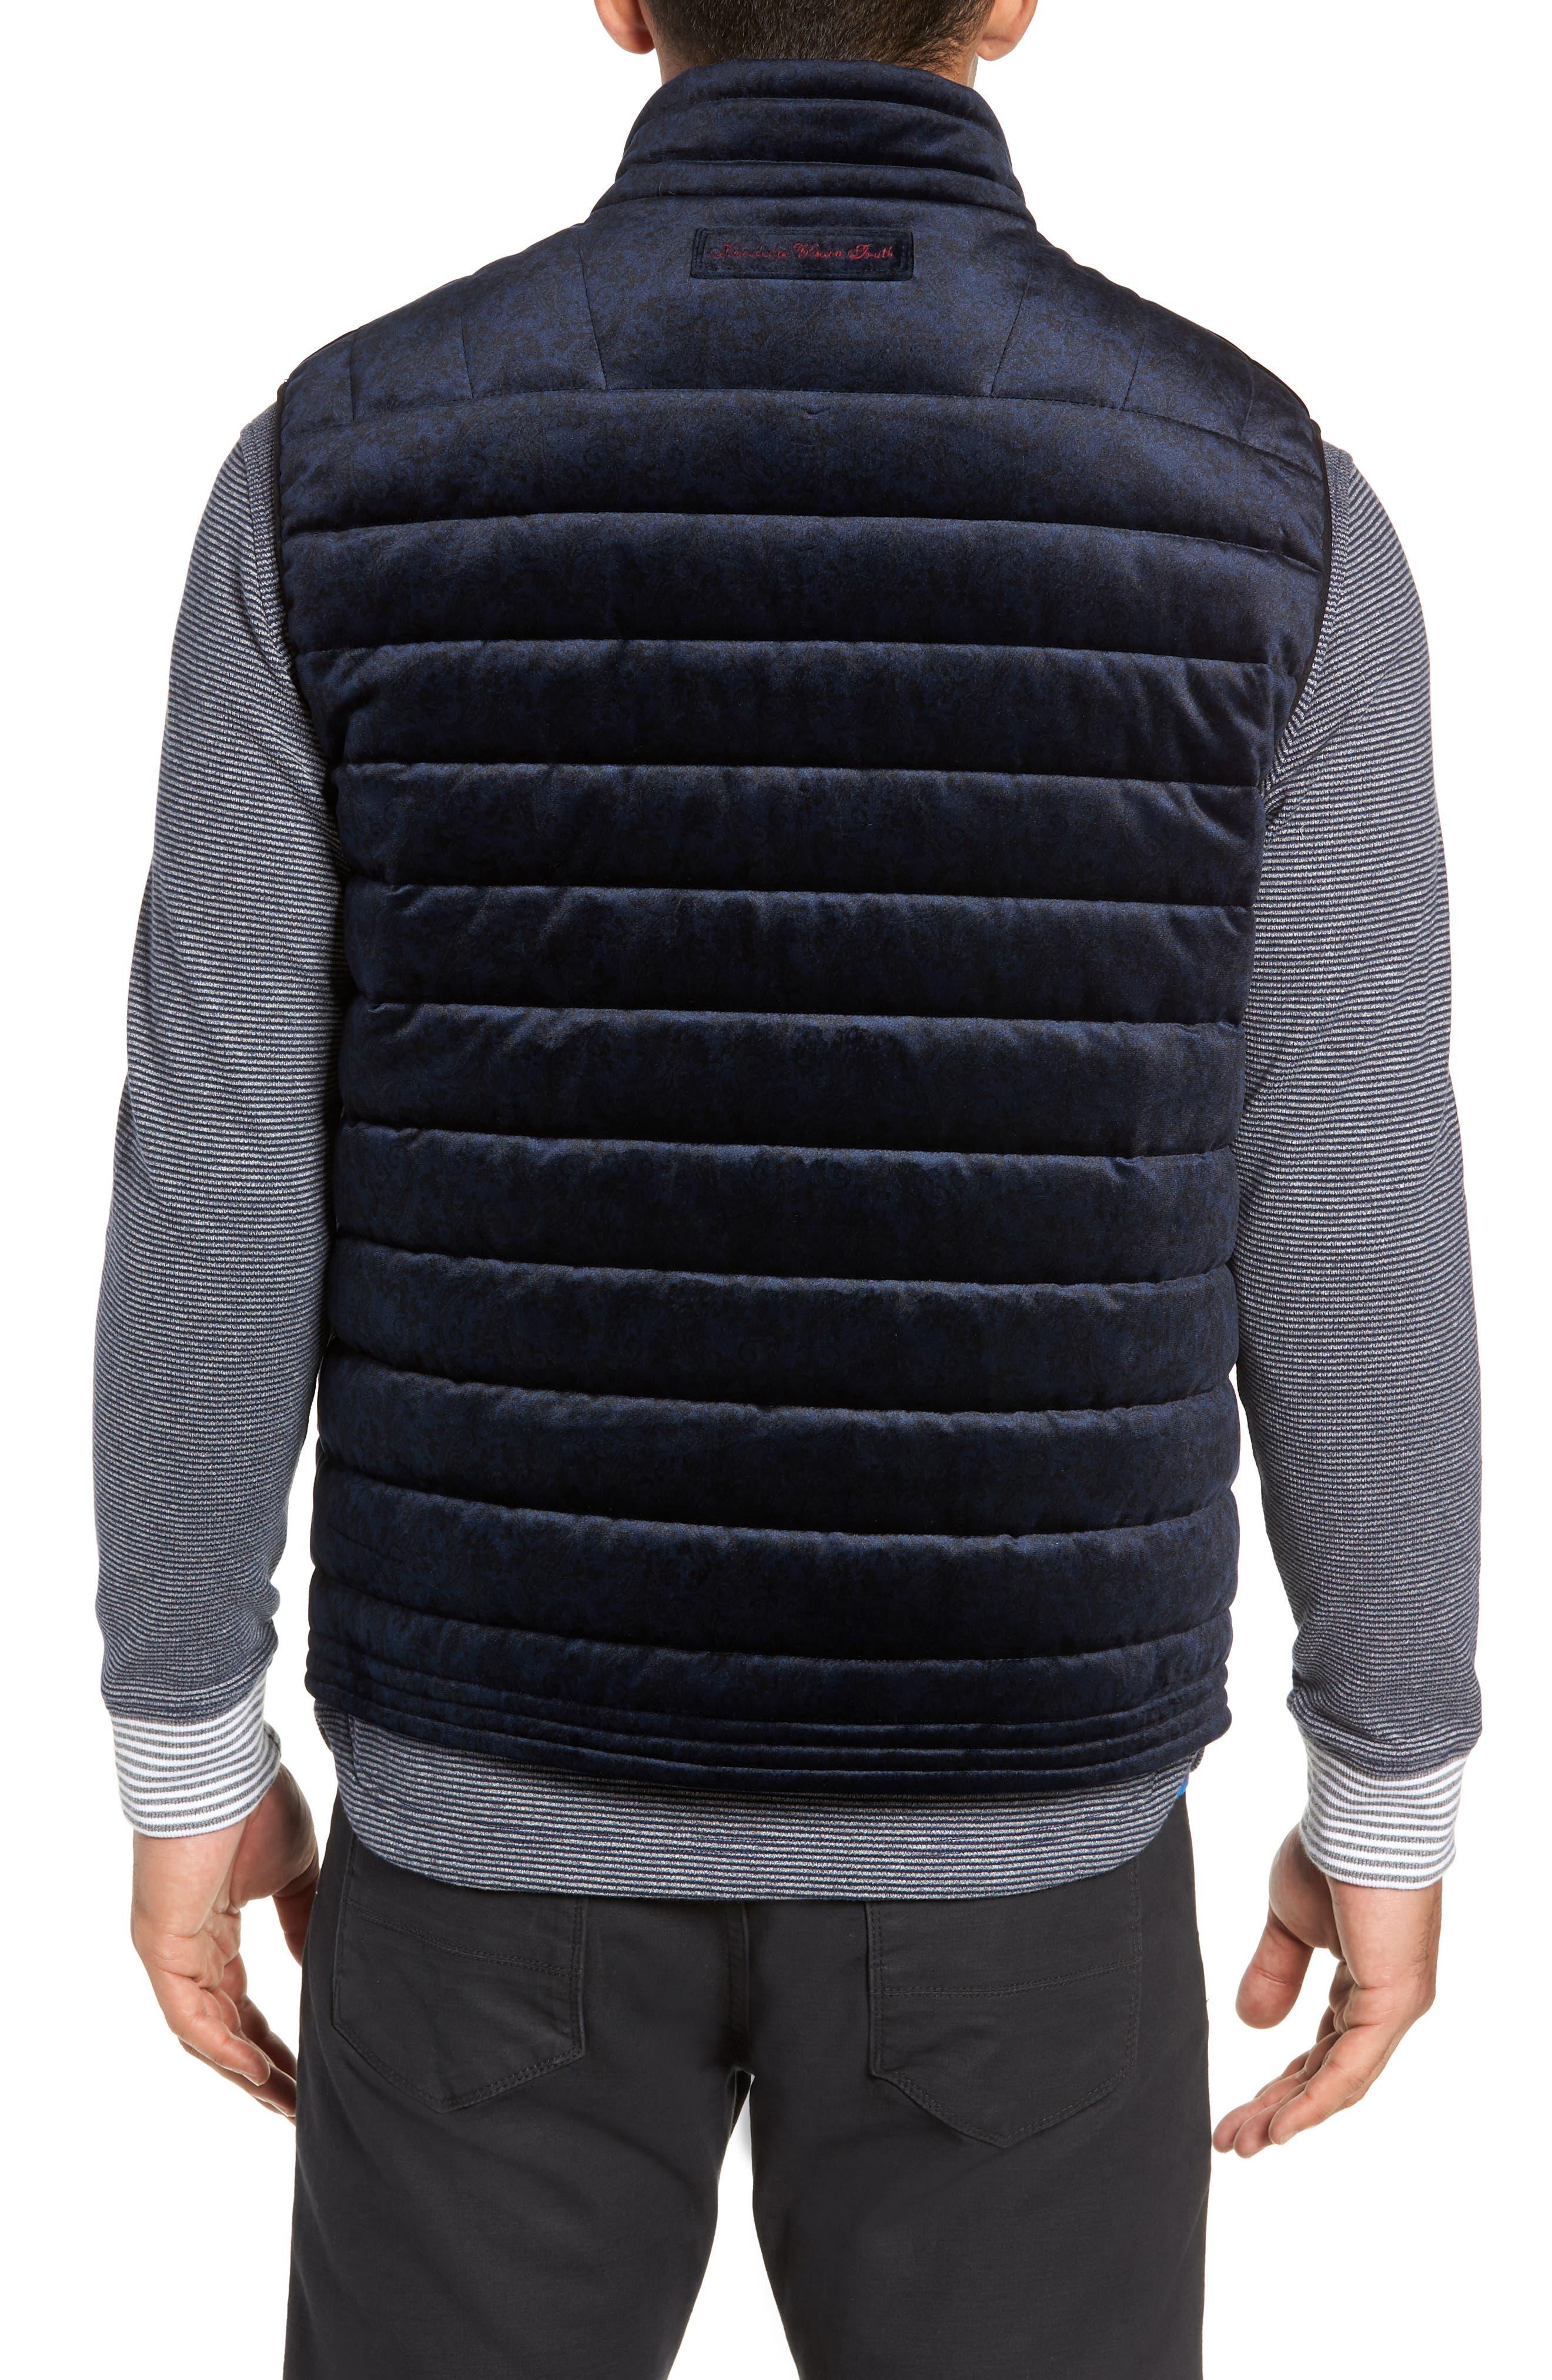 ROBERT GRAHAM,                             Guiffery Classic Fit Quilted Vest,                             Alternate thumbnail 2, color,                             410